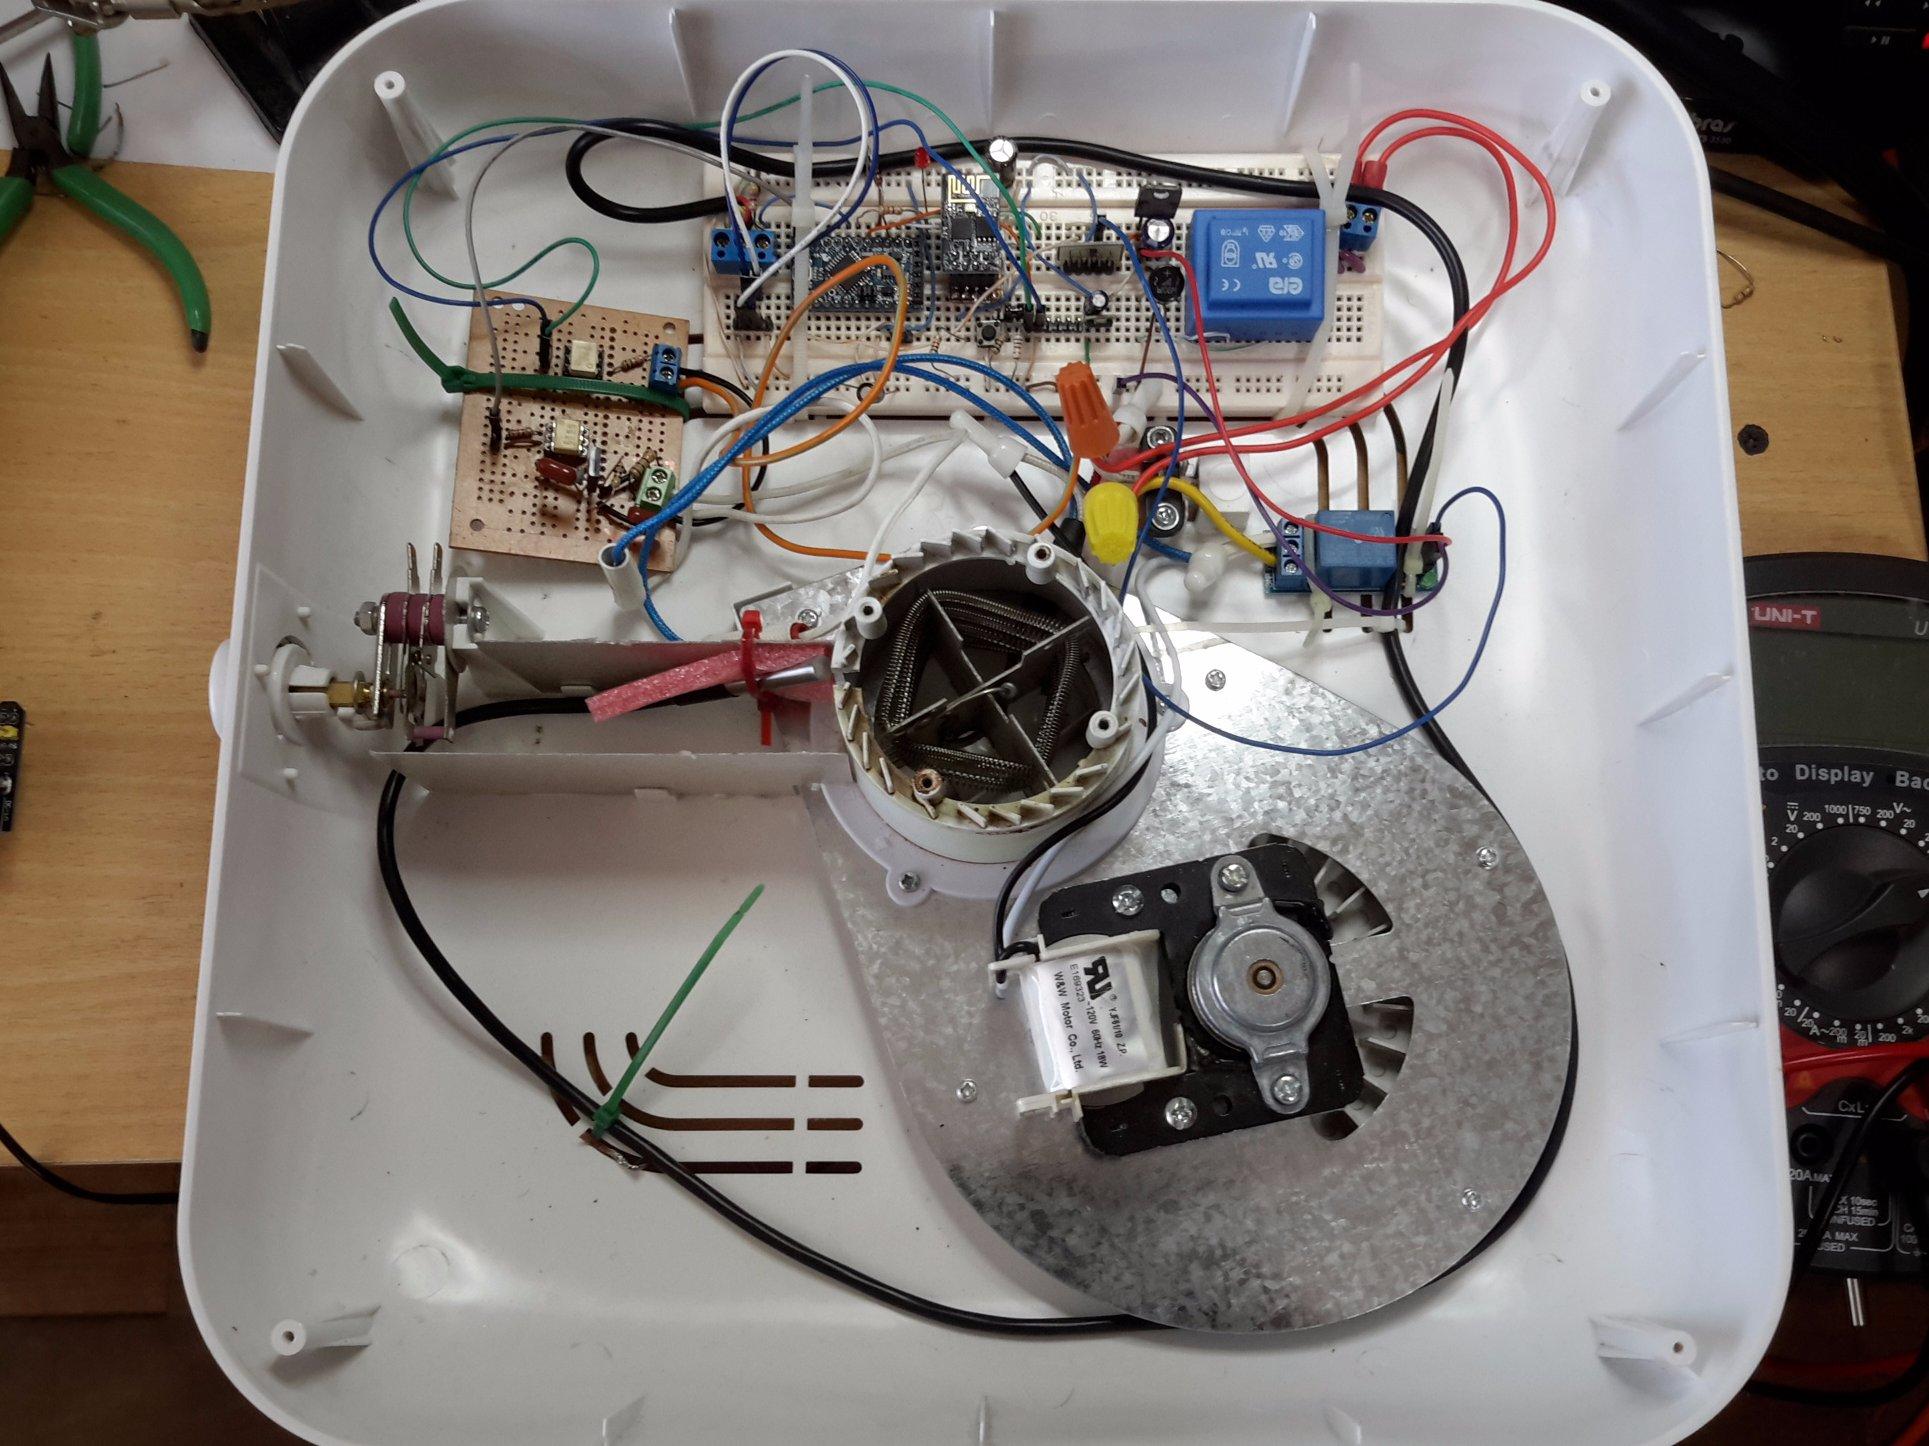 medium resolution of smart dehydrator cooking appliance alexa ready arduino project hub wiring diagram also arduino linear actuator wiring besides mini cooper